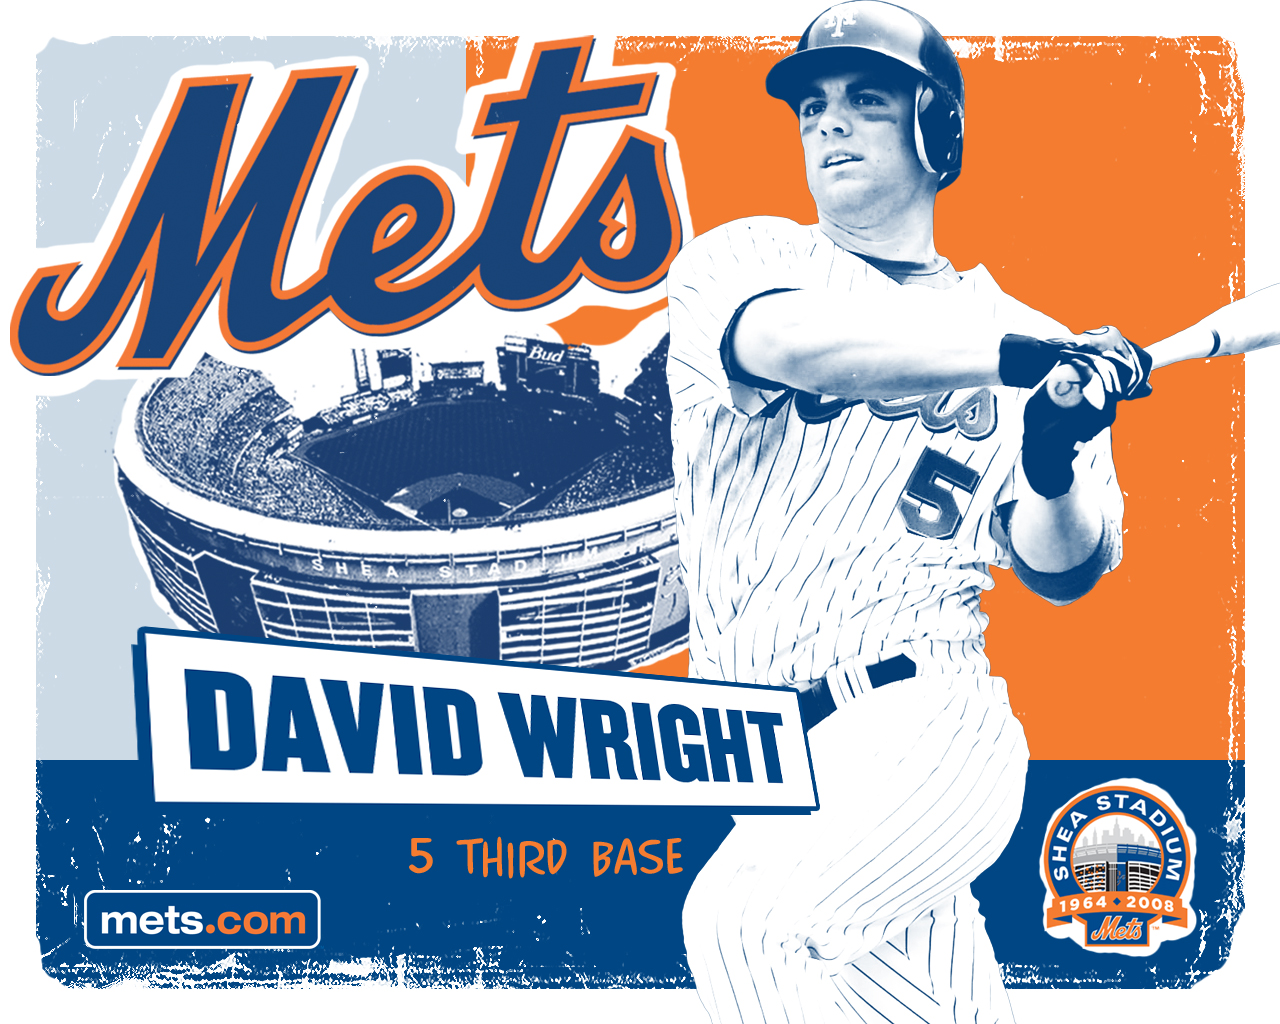 Download New York Mets wallpaper NY Mets David Wright 1280x1024